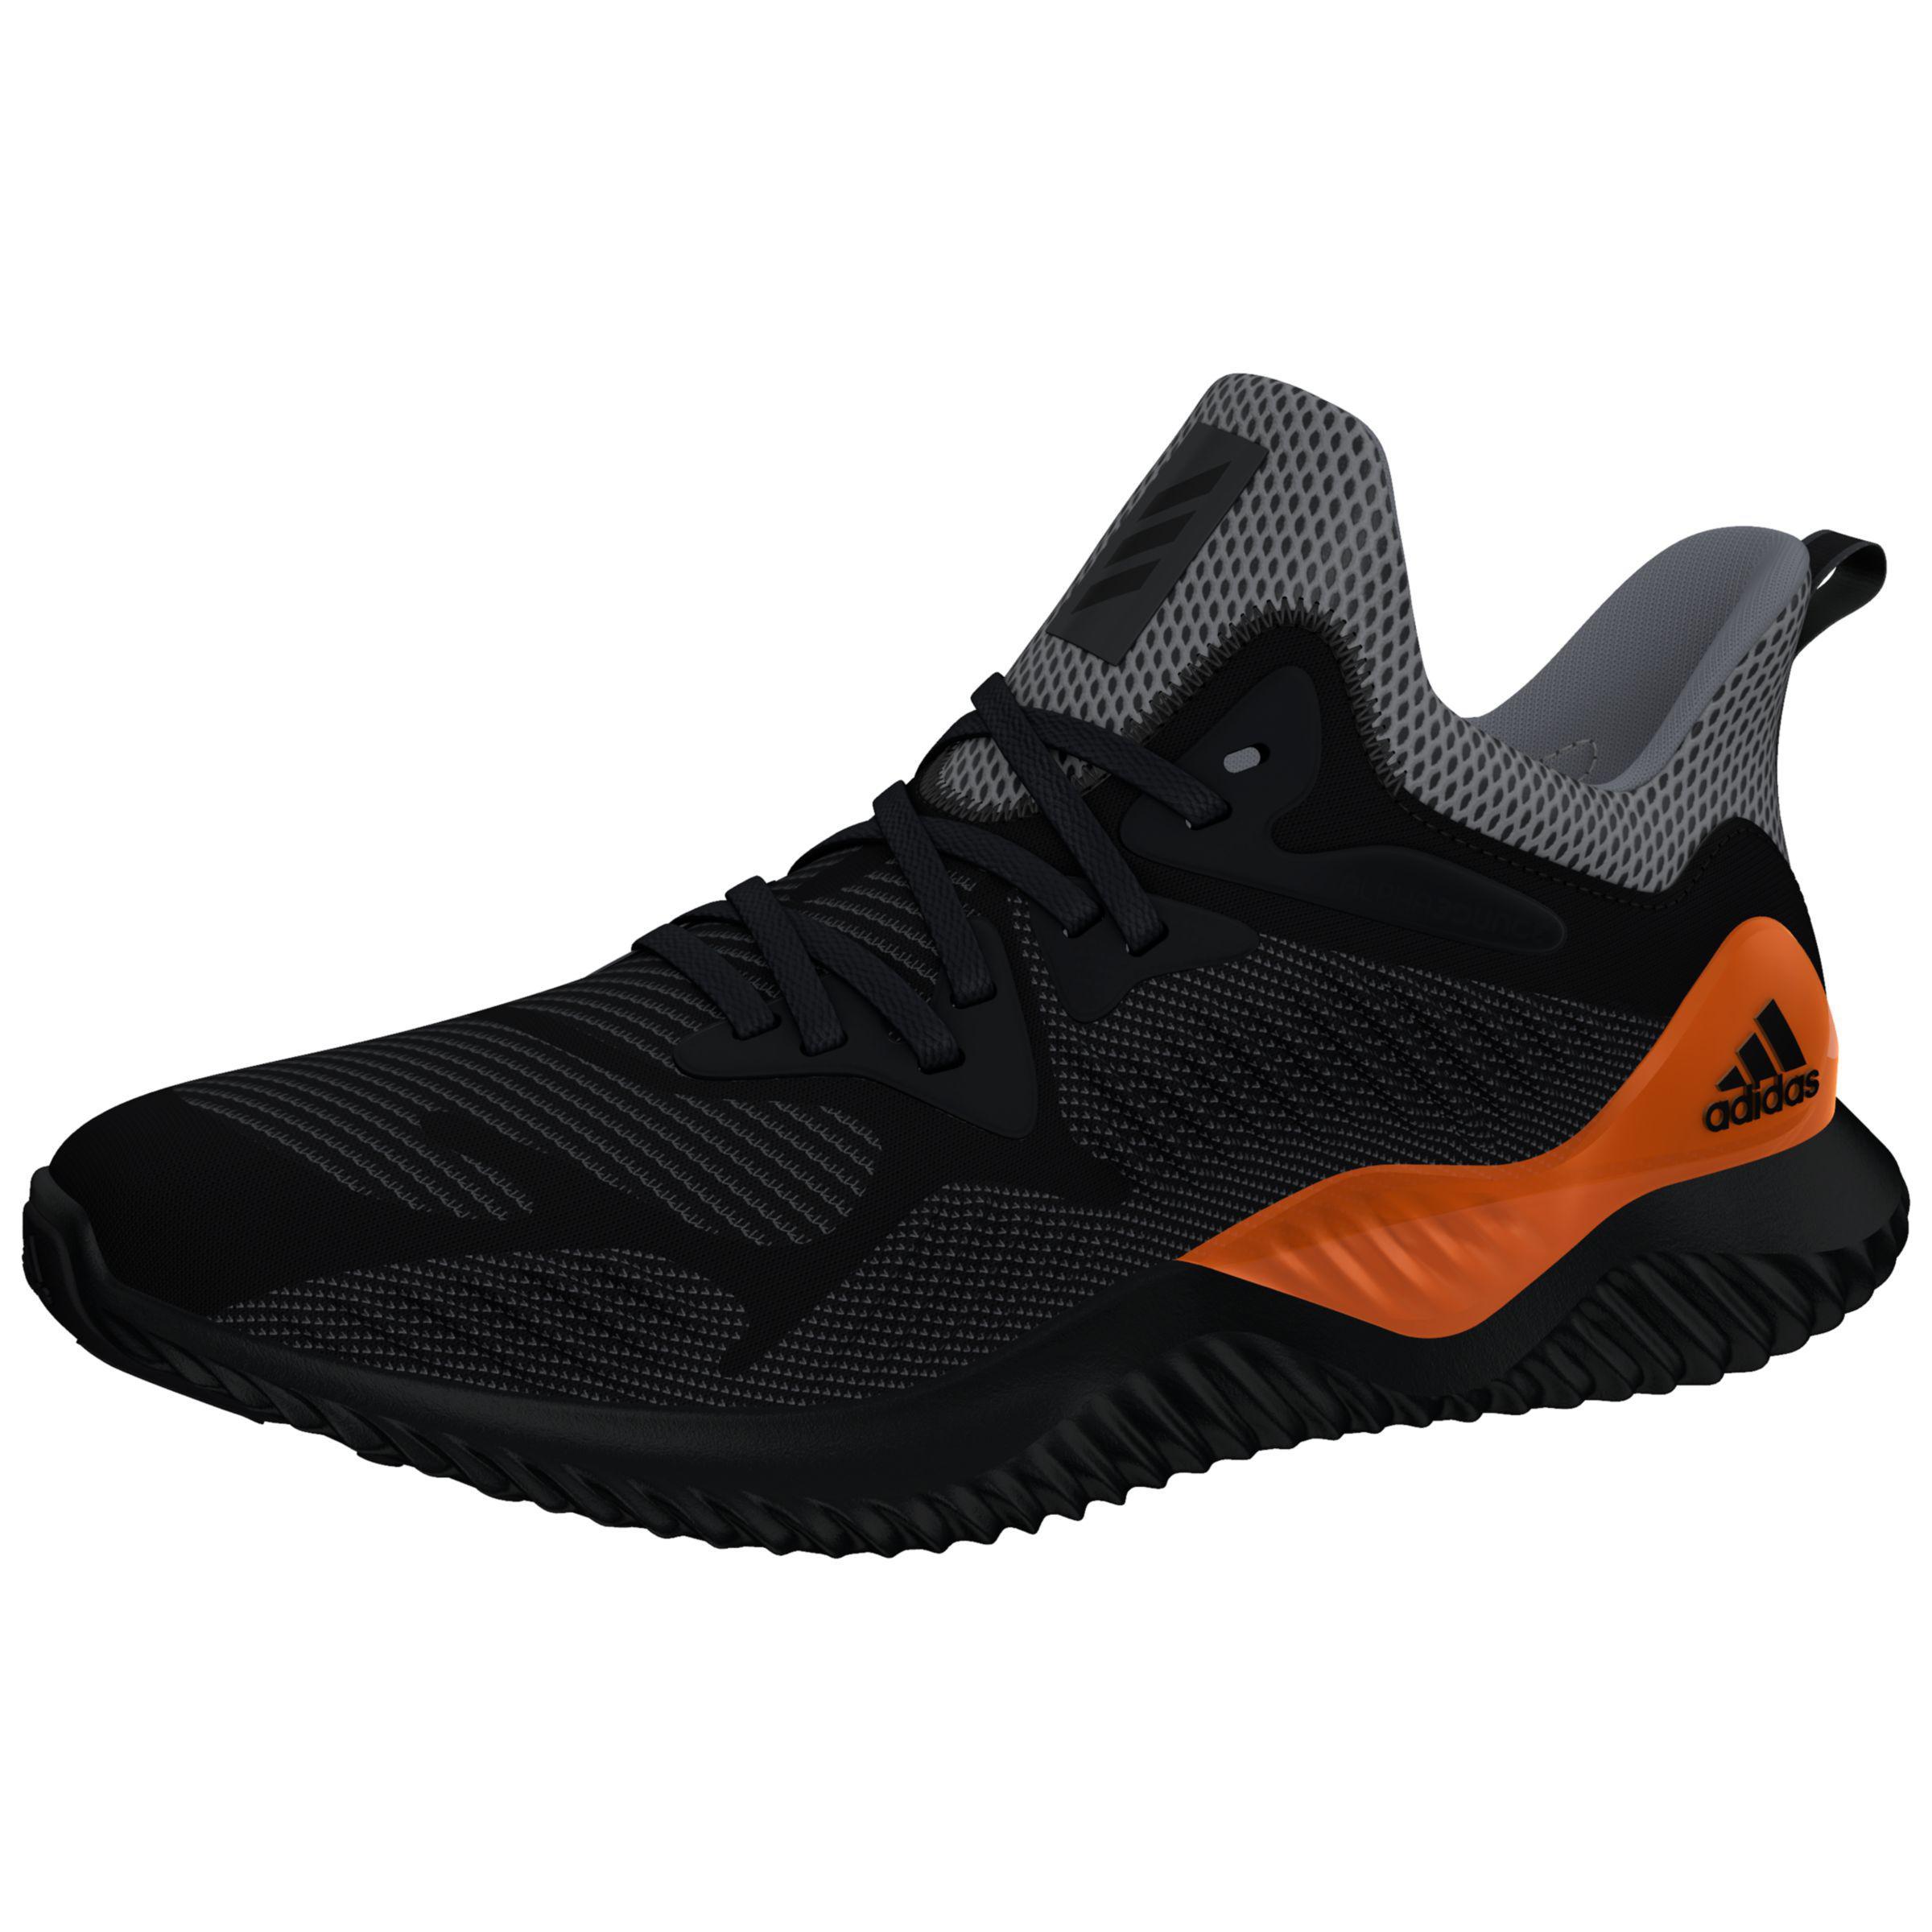 Adidas climachill nero